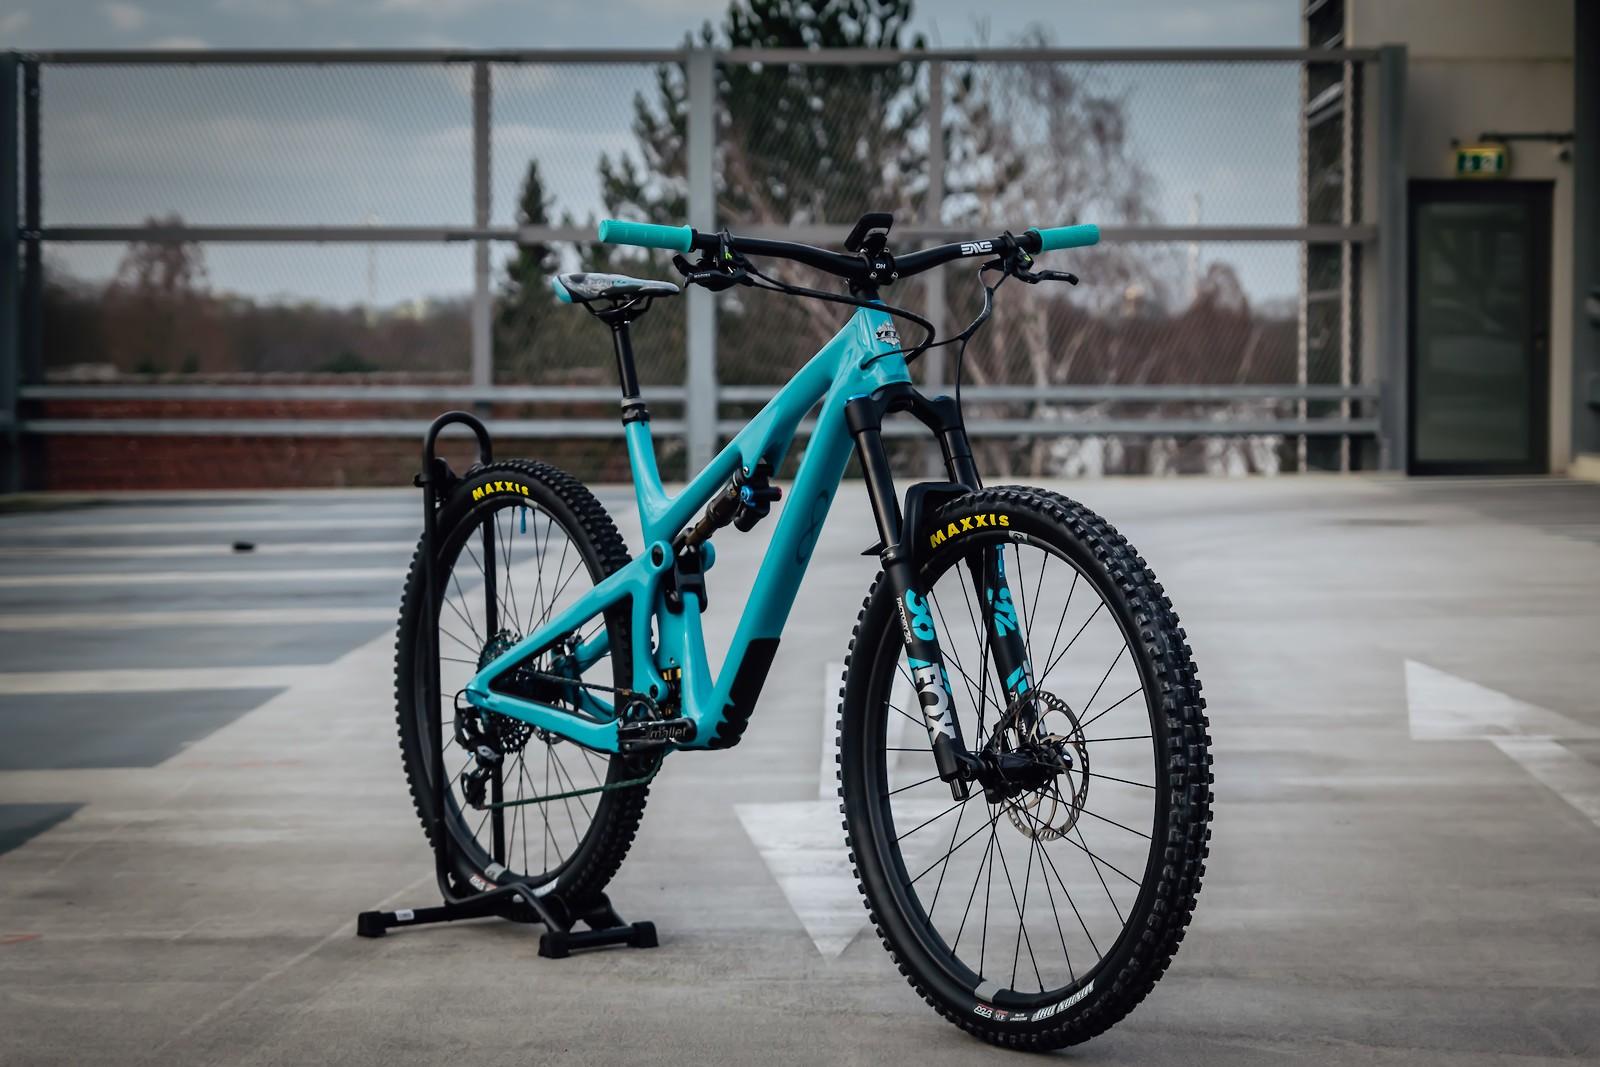 Yeti SB130 Turq Lunchride - Vital Bike of the Day April 2020 - Mountain Biking Pictures - Vital MTB